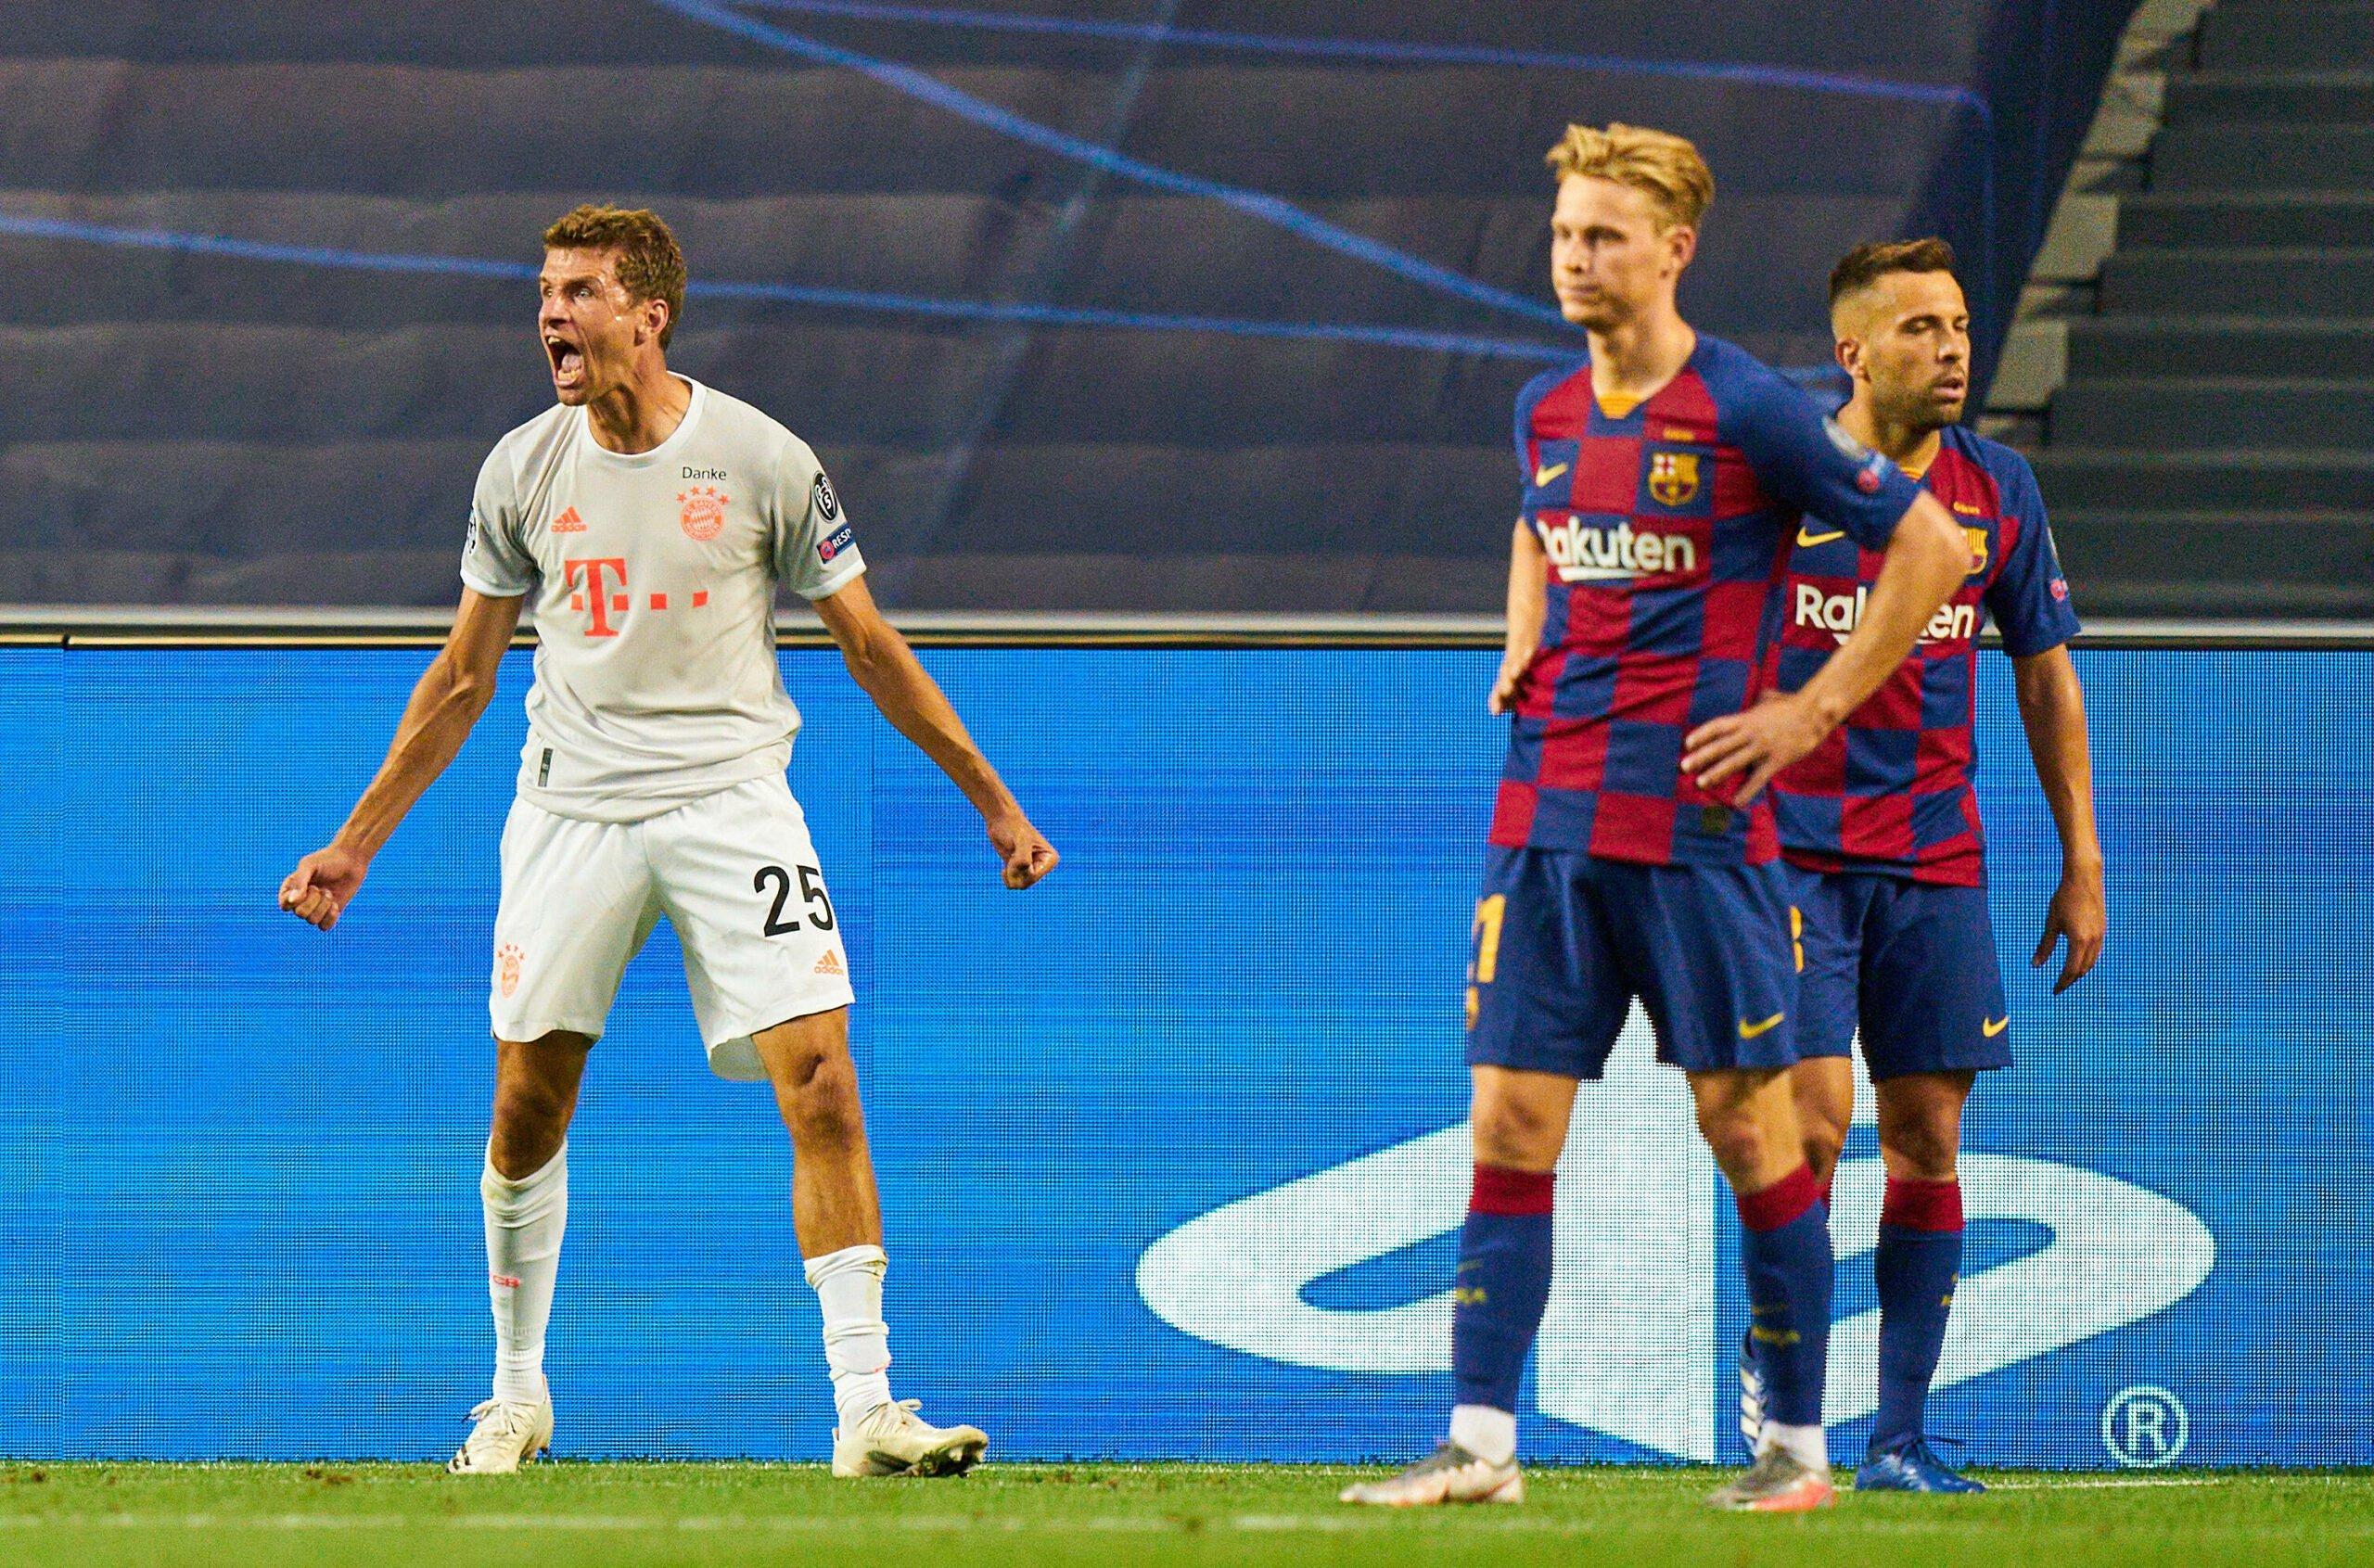 FC Barcelona vs. FC Bayern